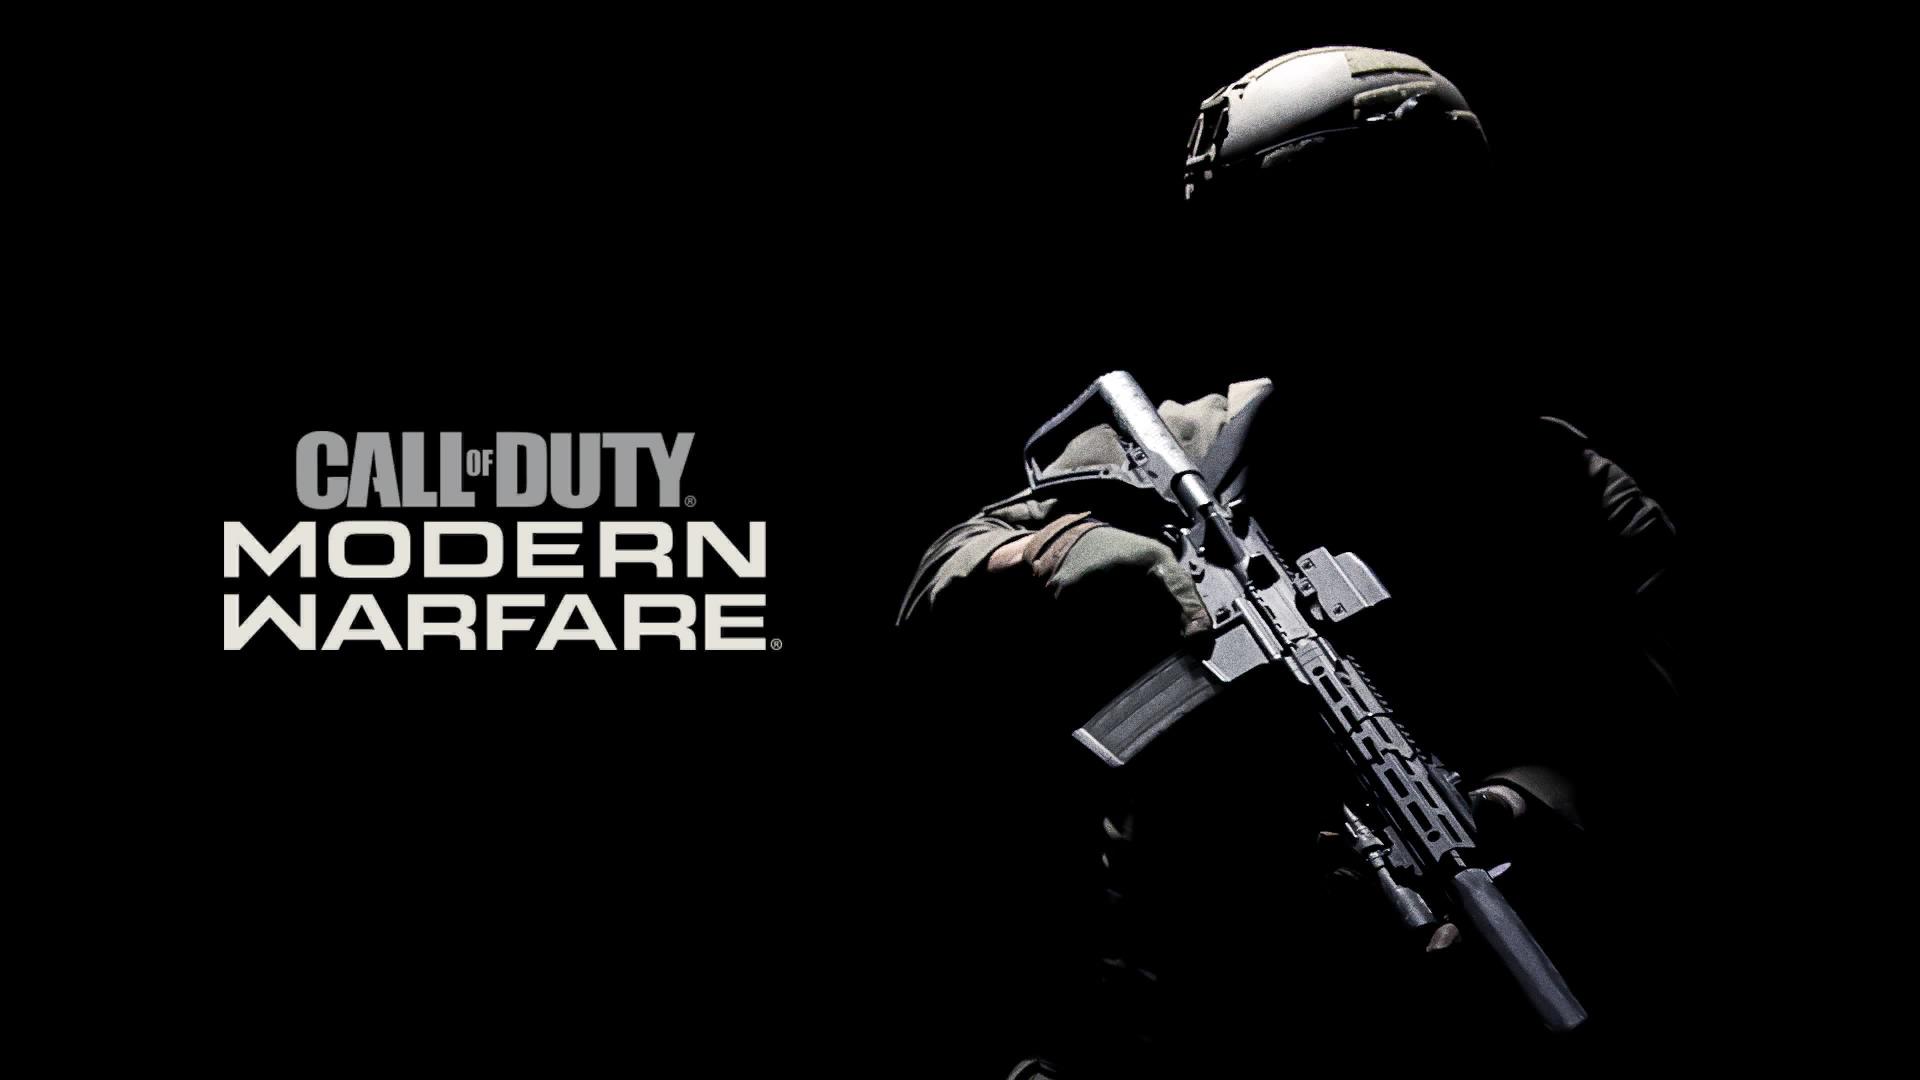 Wallpaper Call Of Duty Modern Warfare Call Of Duty Video Games